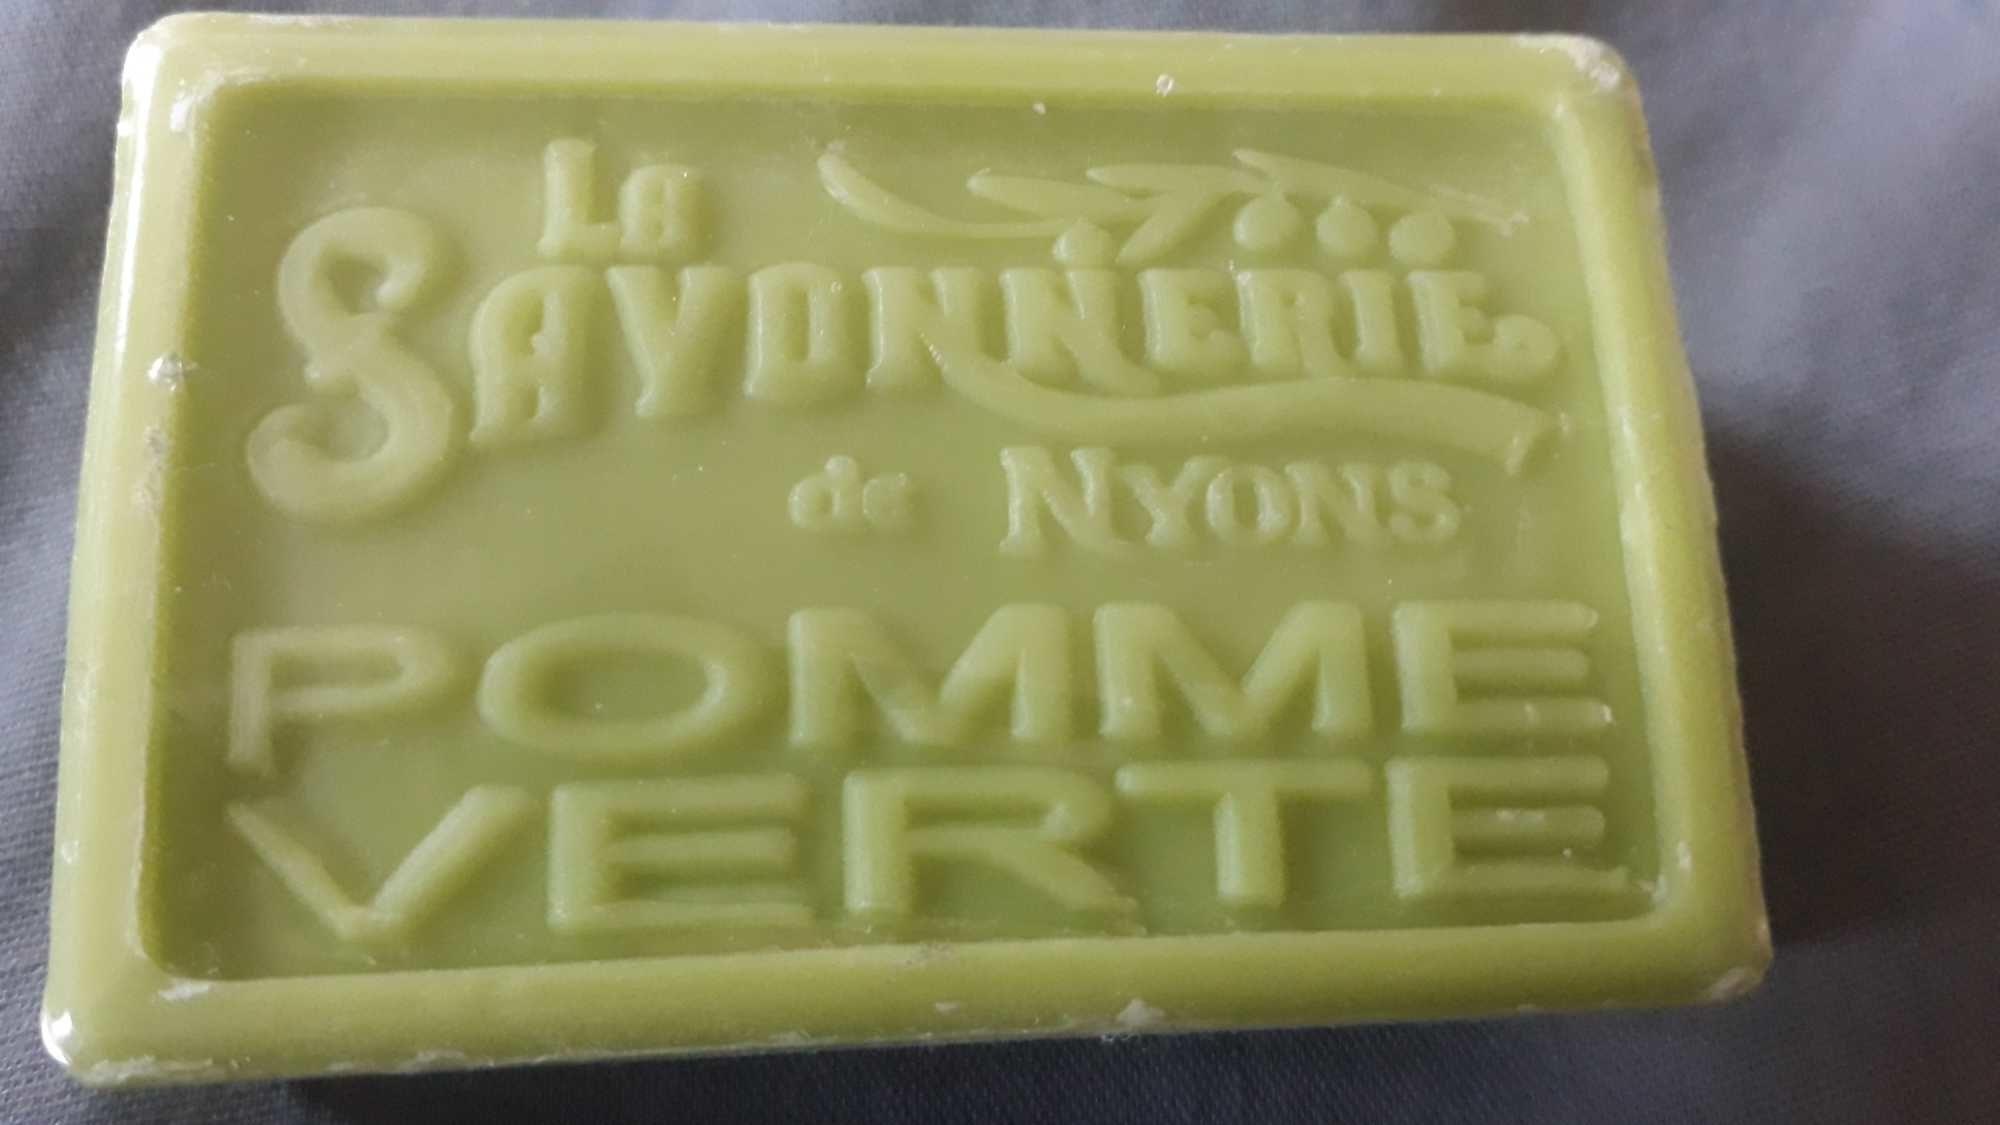 Savon Pomme verte - Product - fr